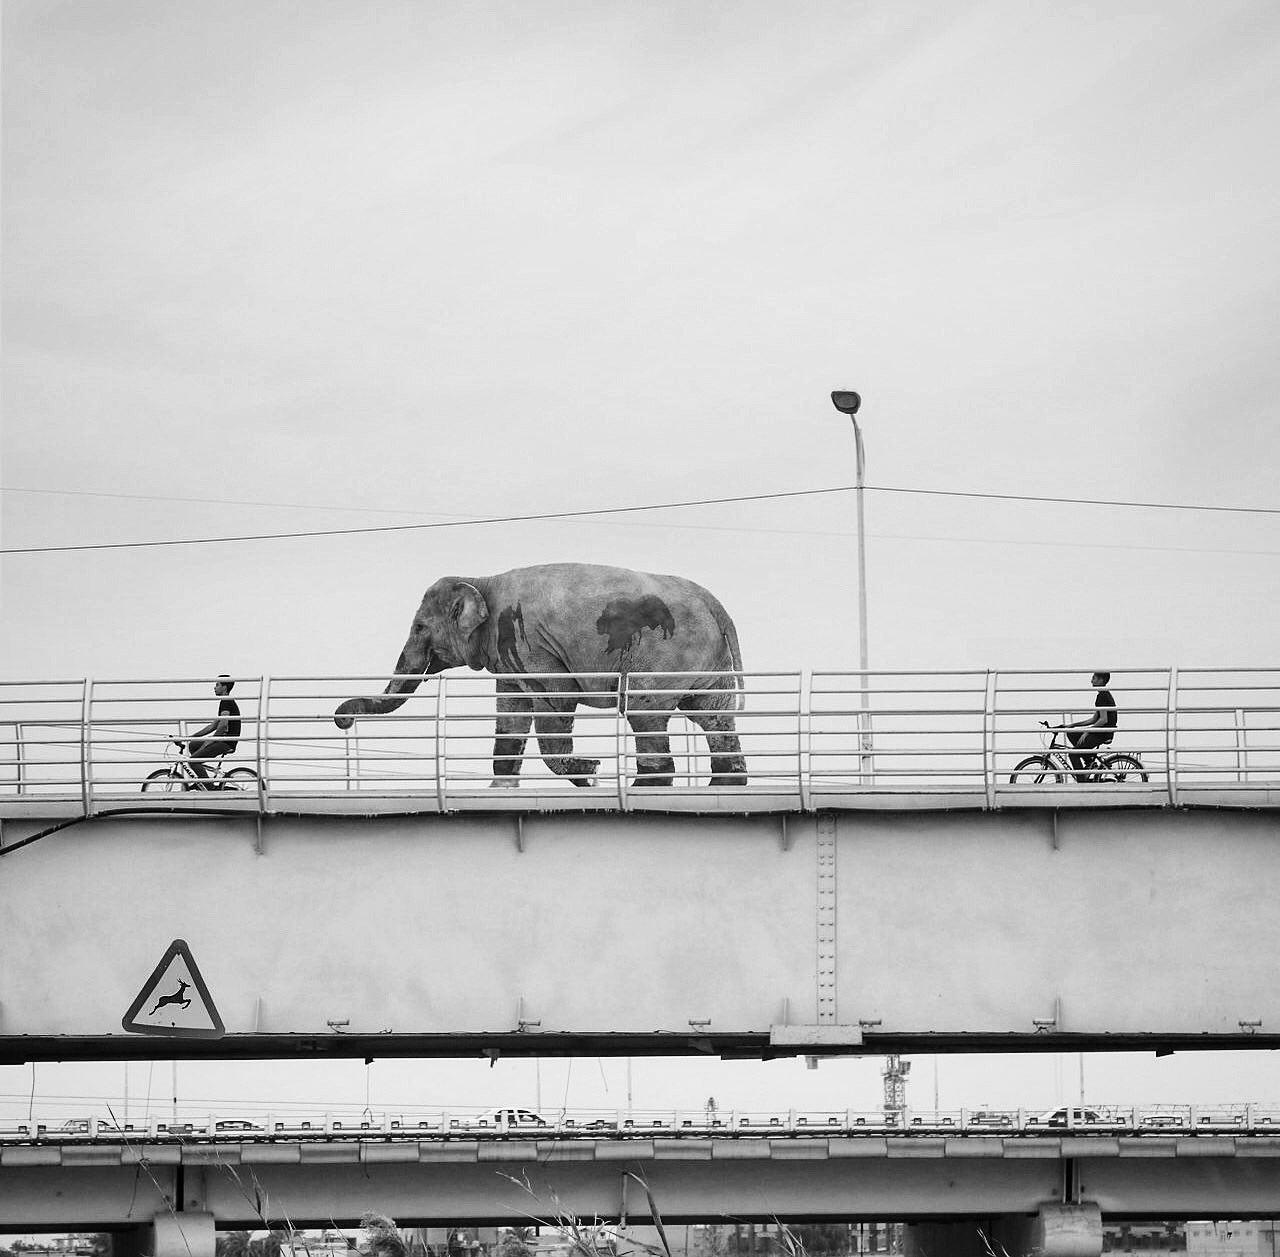 #cross#breeding #animal #animal_editing #animal_fine_art, #animal_flat, #animal_photo, #animal_photography, #animal_surreal,#bear, #bird, #birds, #black, #black_and_white, Hossein Mehrzad